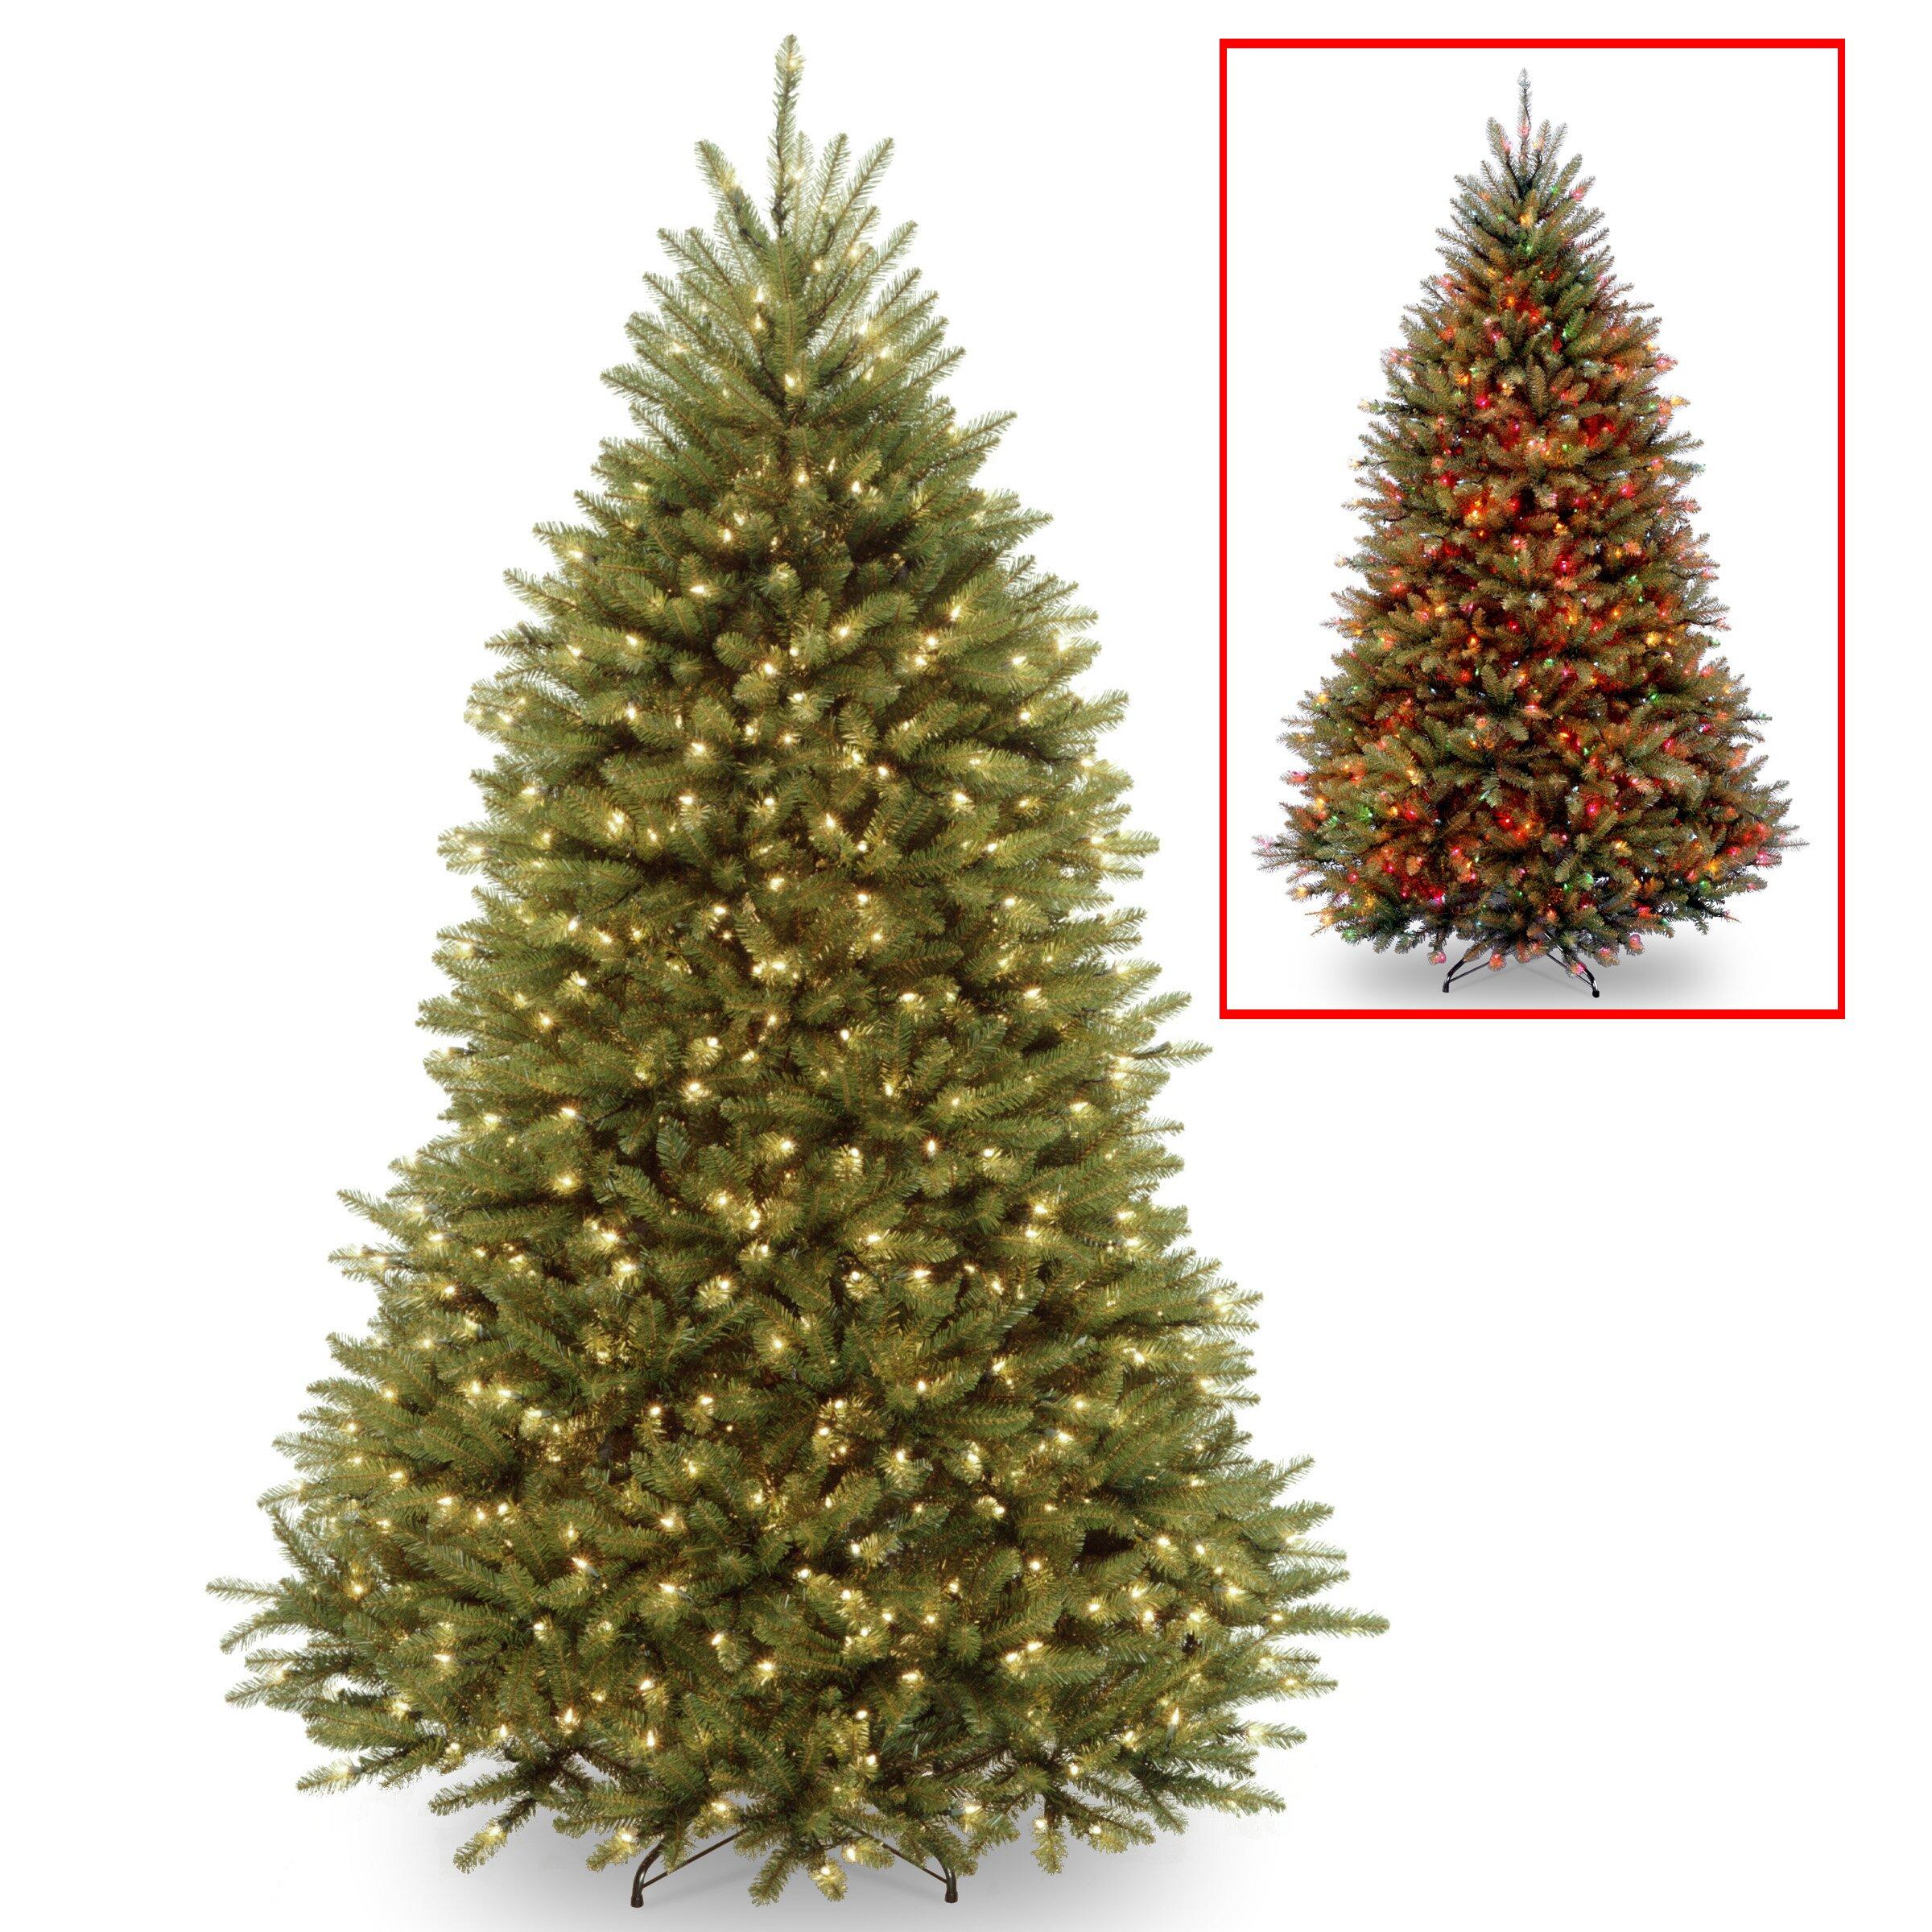 White Fir Christmas Tree: National Tree Co. Dunhill Fir 7.5' Hinged Green Artificial